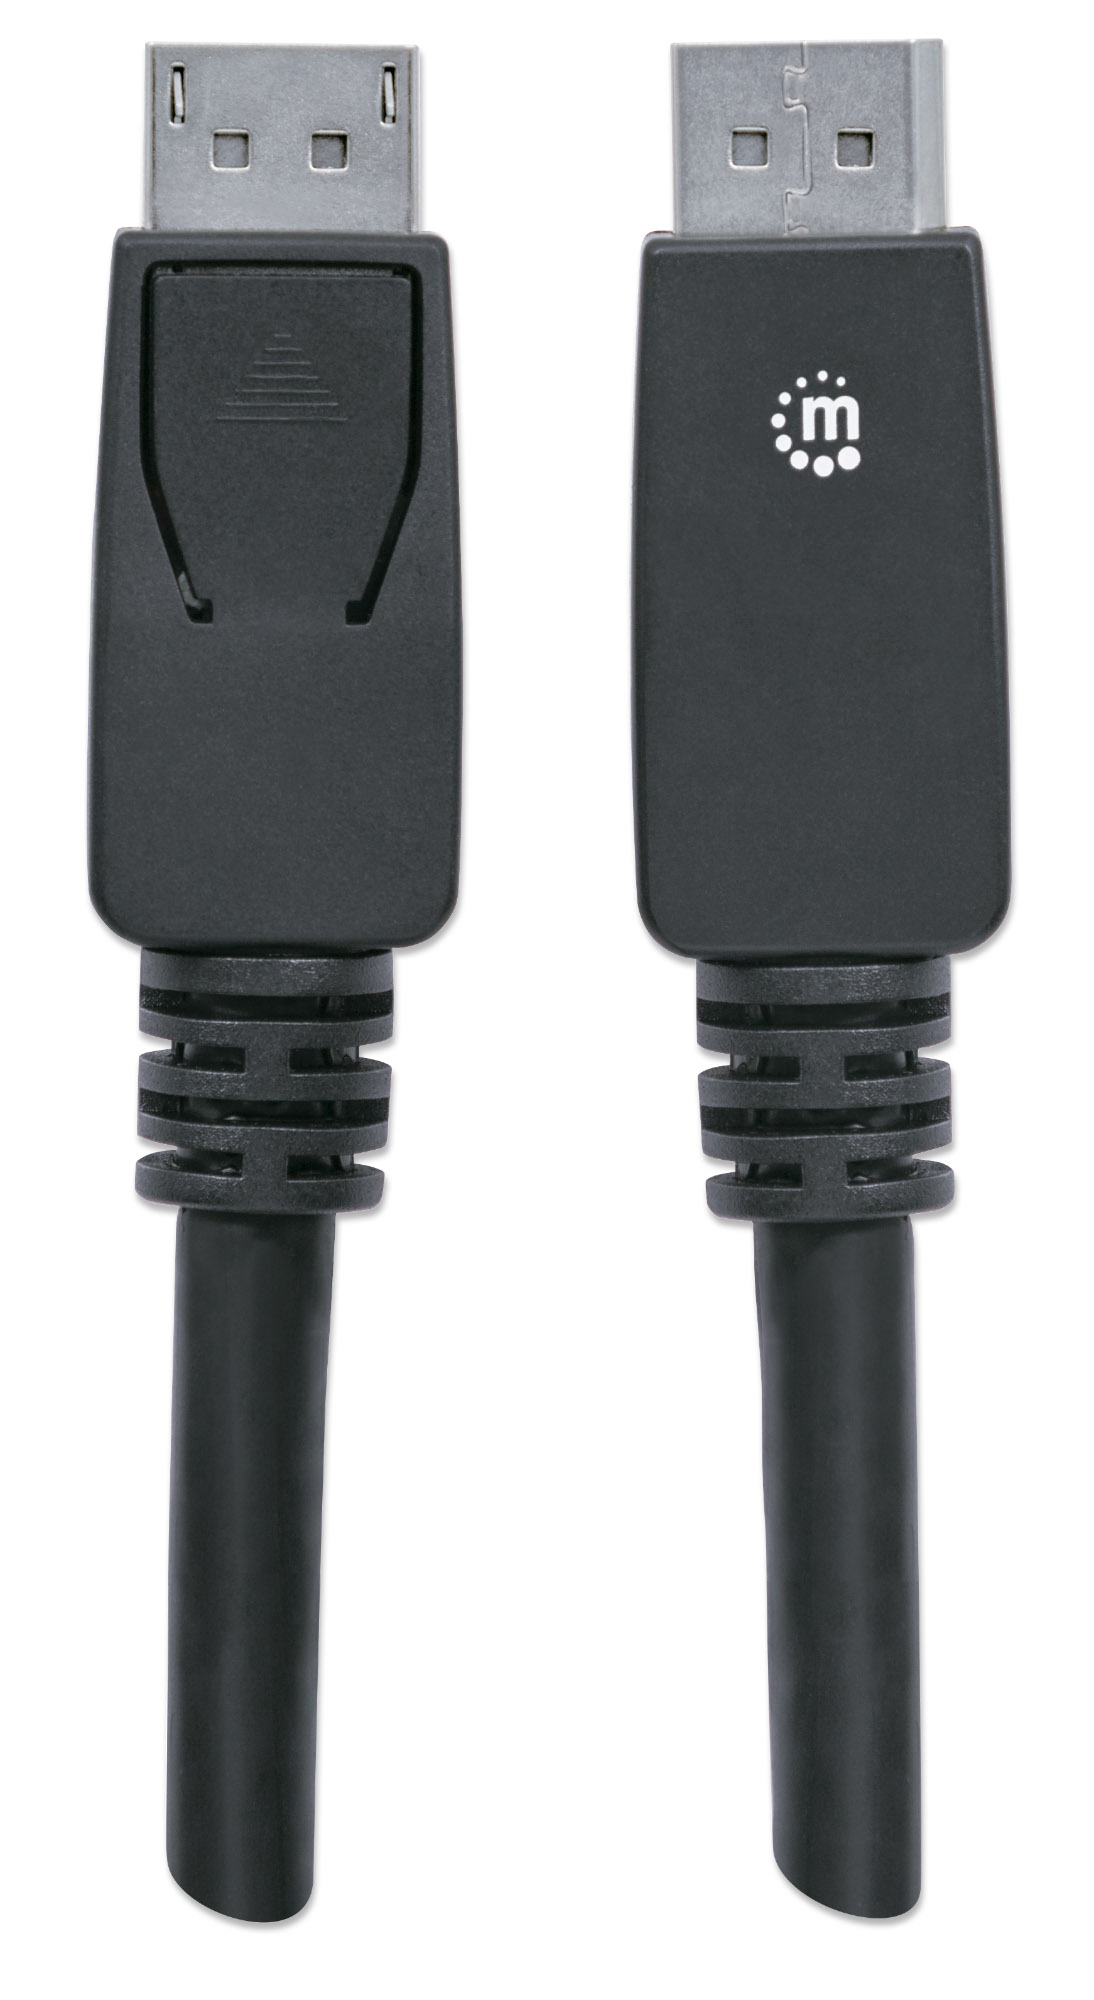 4K@60Hz DisplayPort Monitor Cable